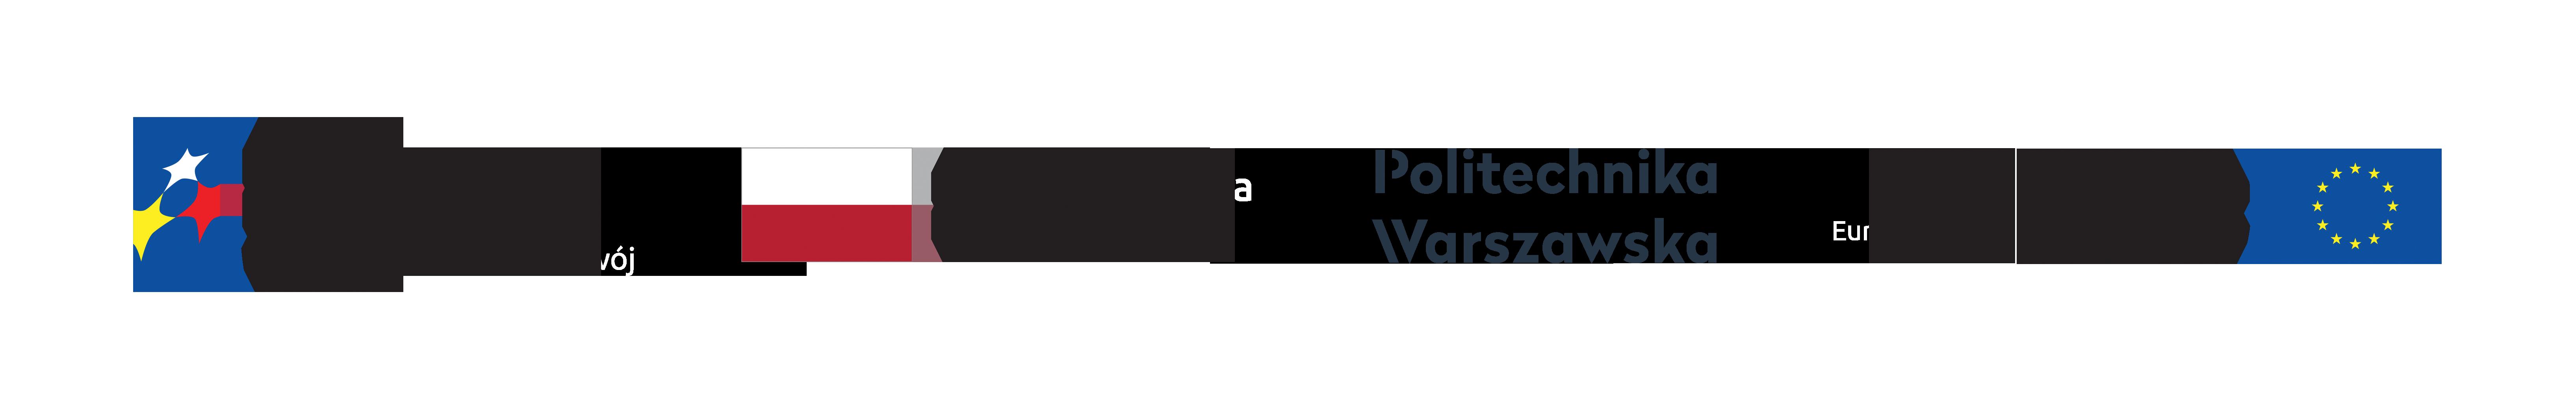 https://www.cziitt.pw.edu.pl/wp-content/uploads/2019/07/Loga-projekt.png